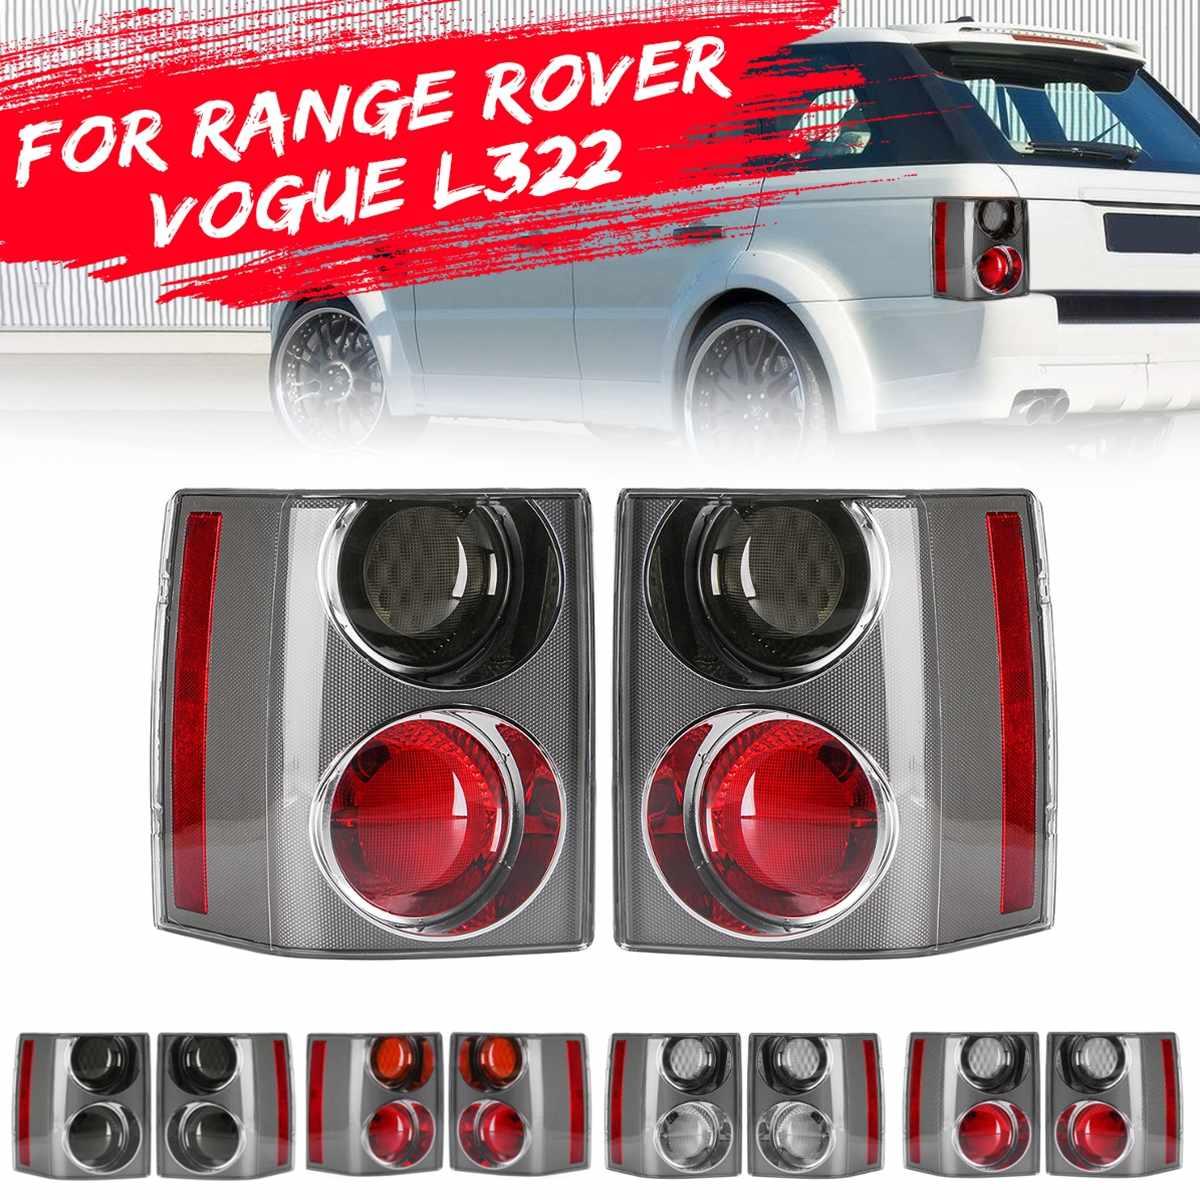 Luz trasera para Land Rover RANGE ROVER VOGUE L322 2002 2003 2004 2005 2006 2007 2008 2009 luz trasera antiniebla reverso Drl